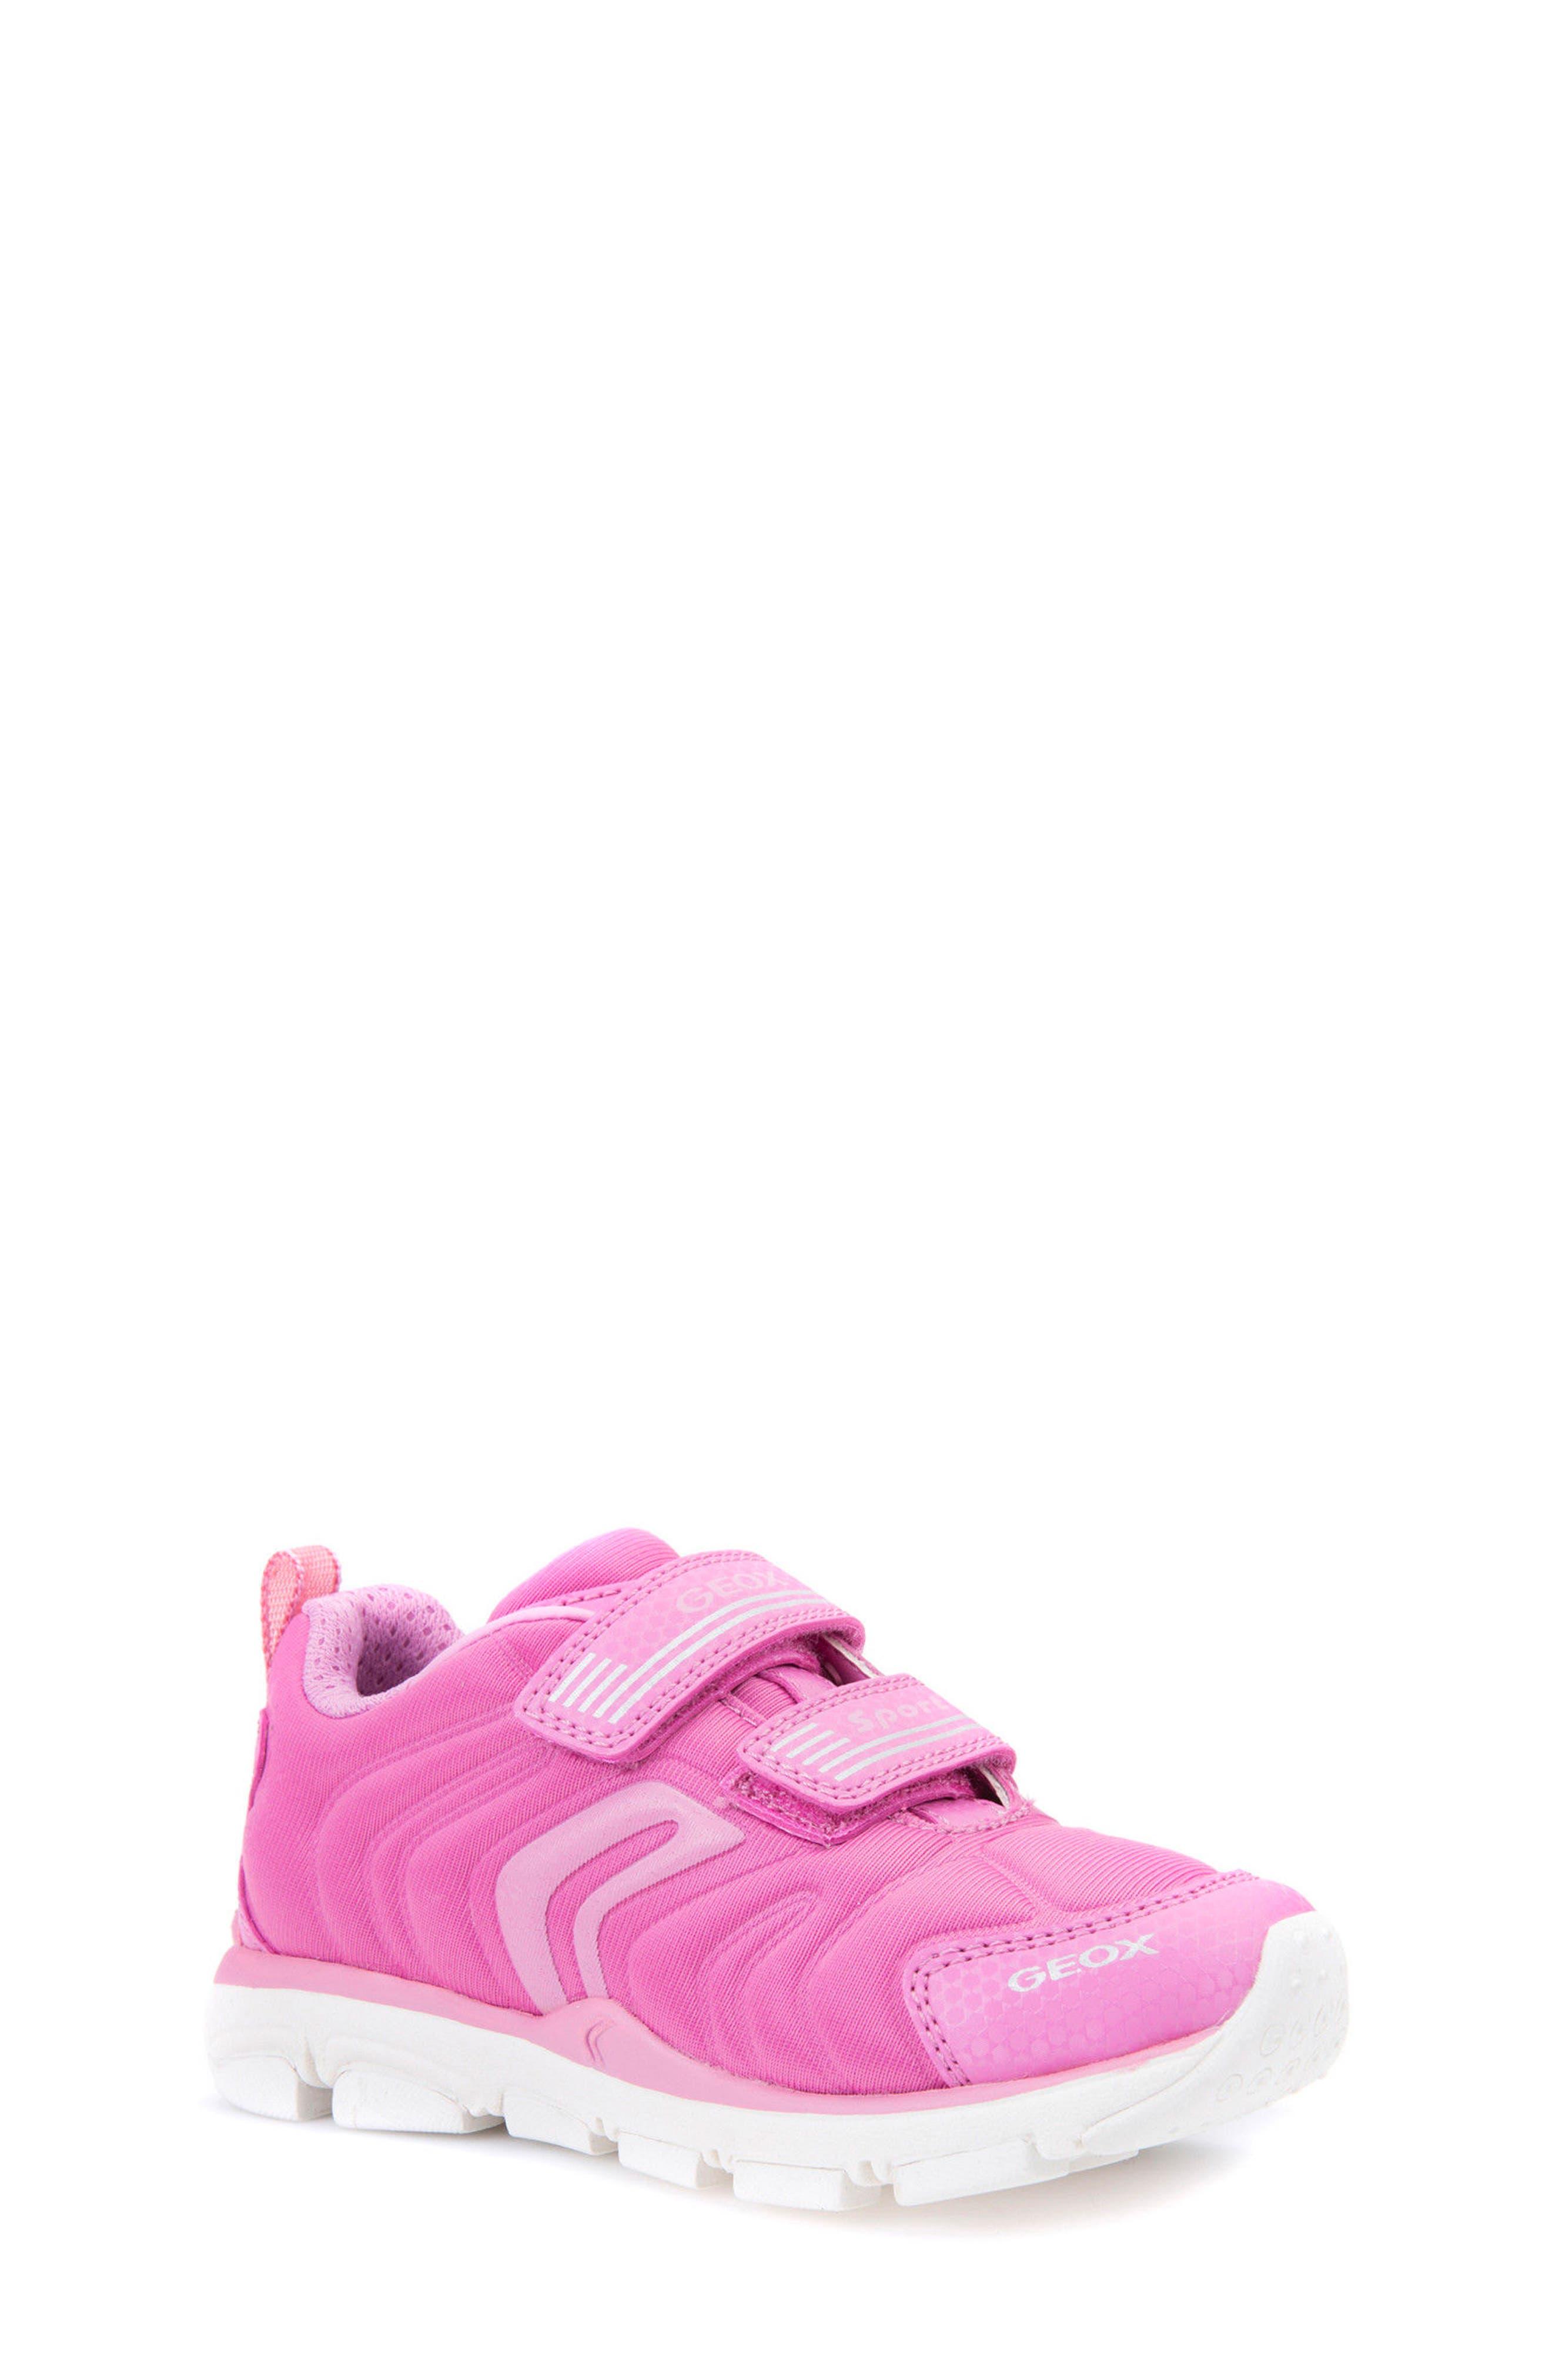 Torque Sneaker,                         Main,                         color, 660